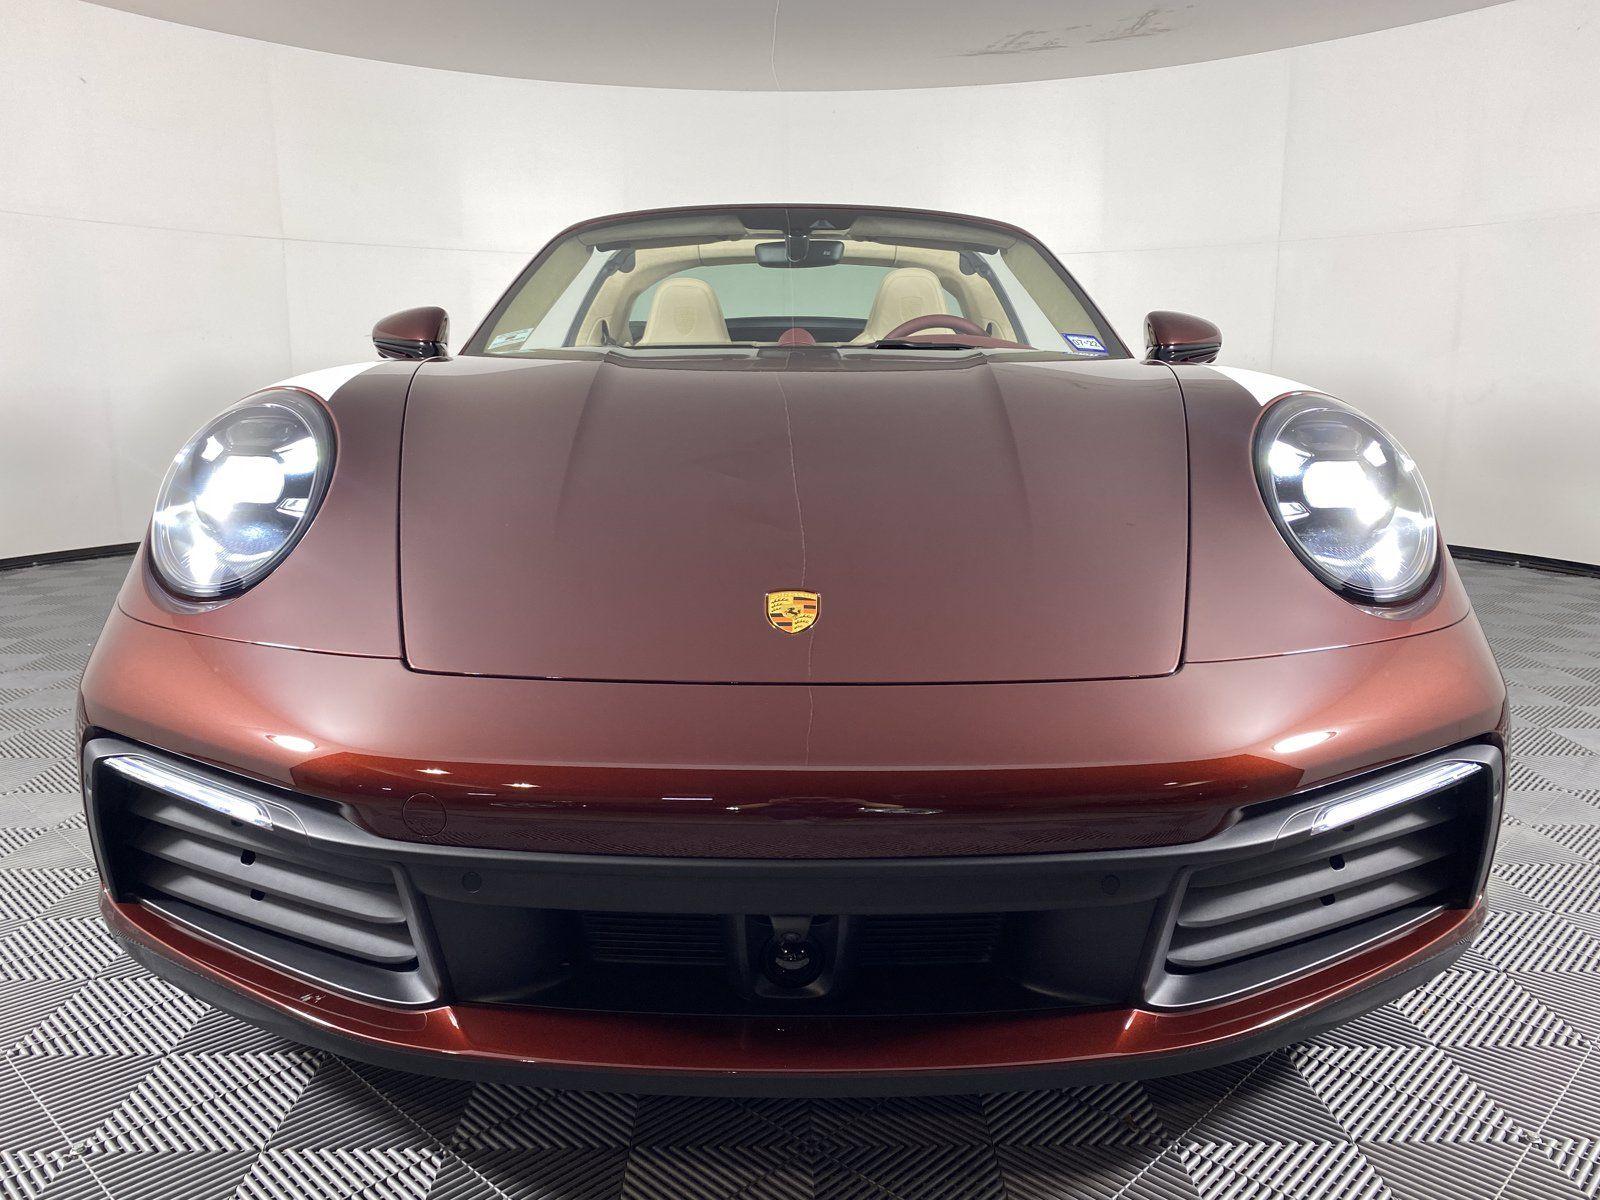 2021 Porsche 911 Targa 4S Heritage Design Edition – 3